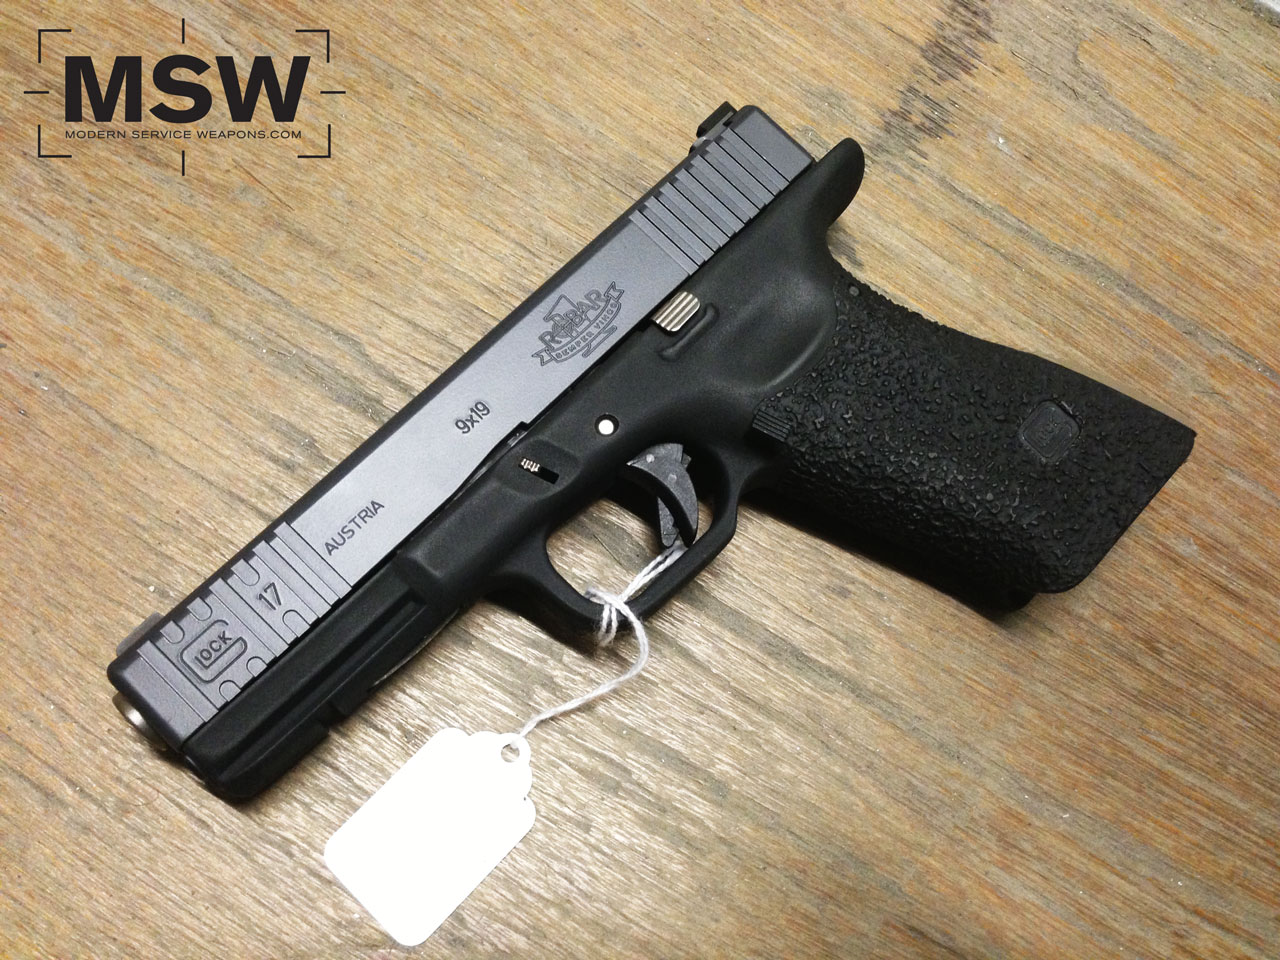 Glock 30 Custom Slide Customized glock 17 by robarGlock 30 Custom Slide